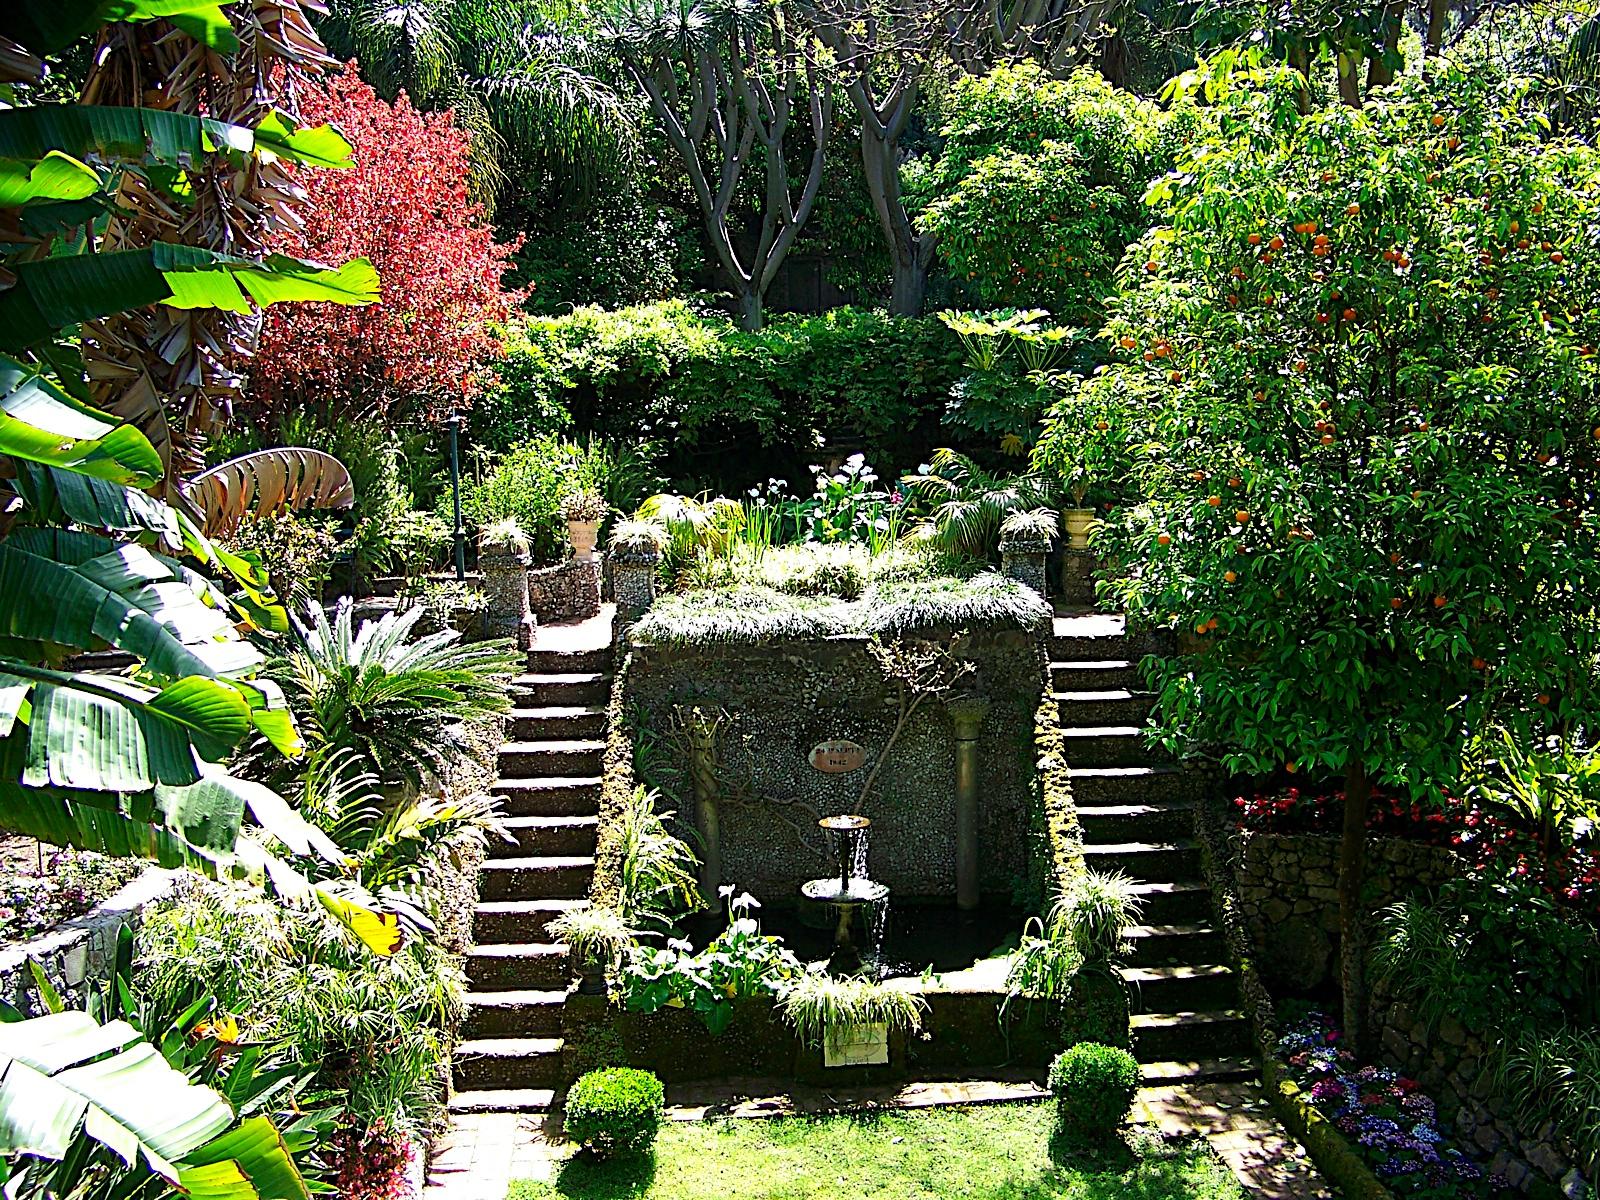 Delicieux File:The Dell, Gibraltar Botanic Gardens 4